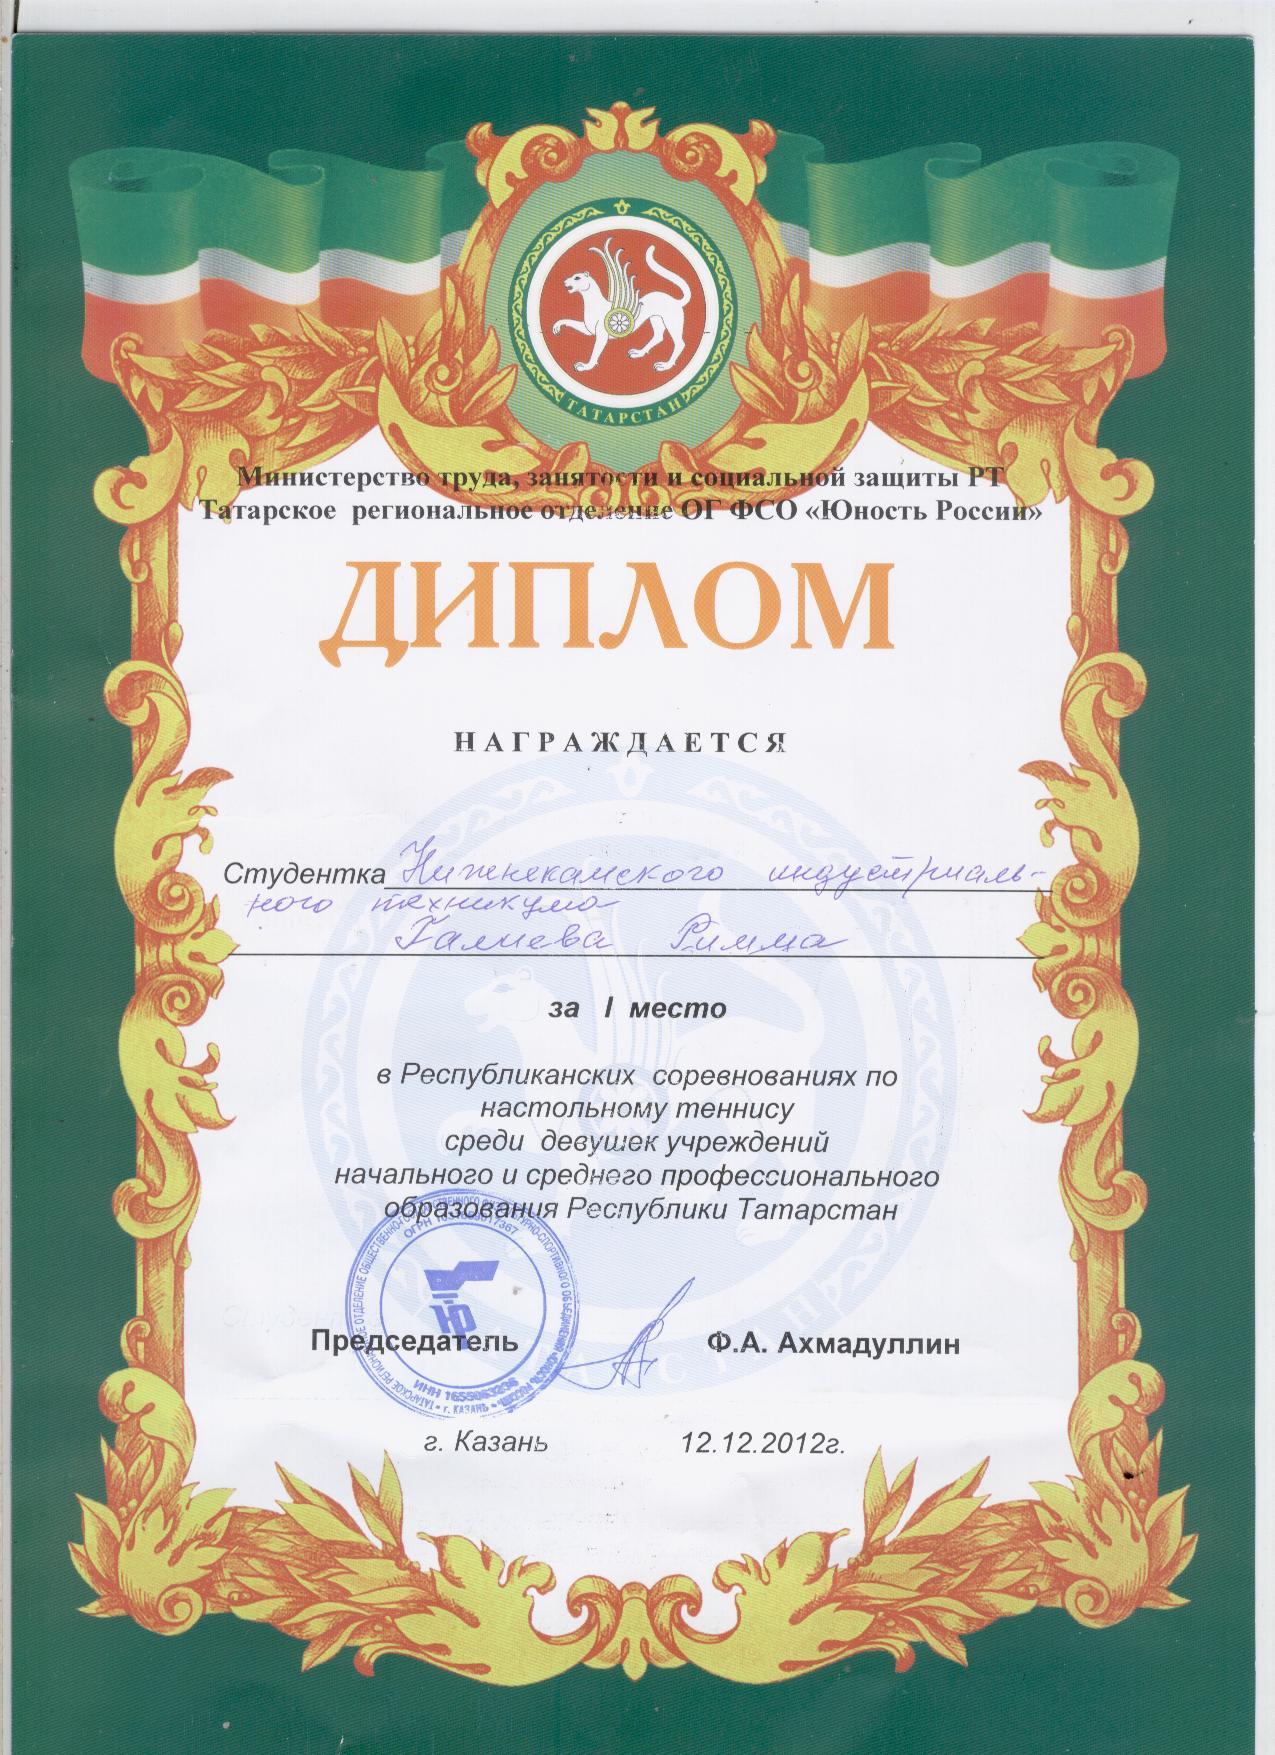 F:\Всероссйский конкурс Портфолио выпускника\РИММА\Римма 023.jpg